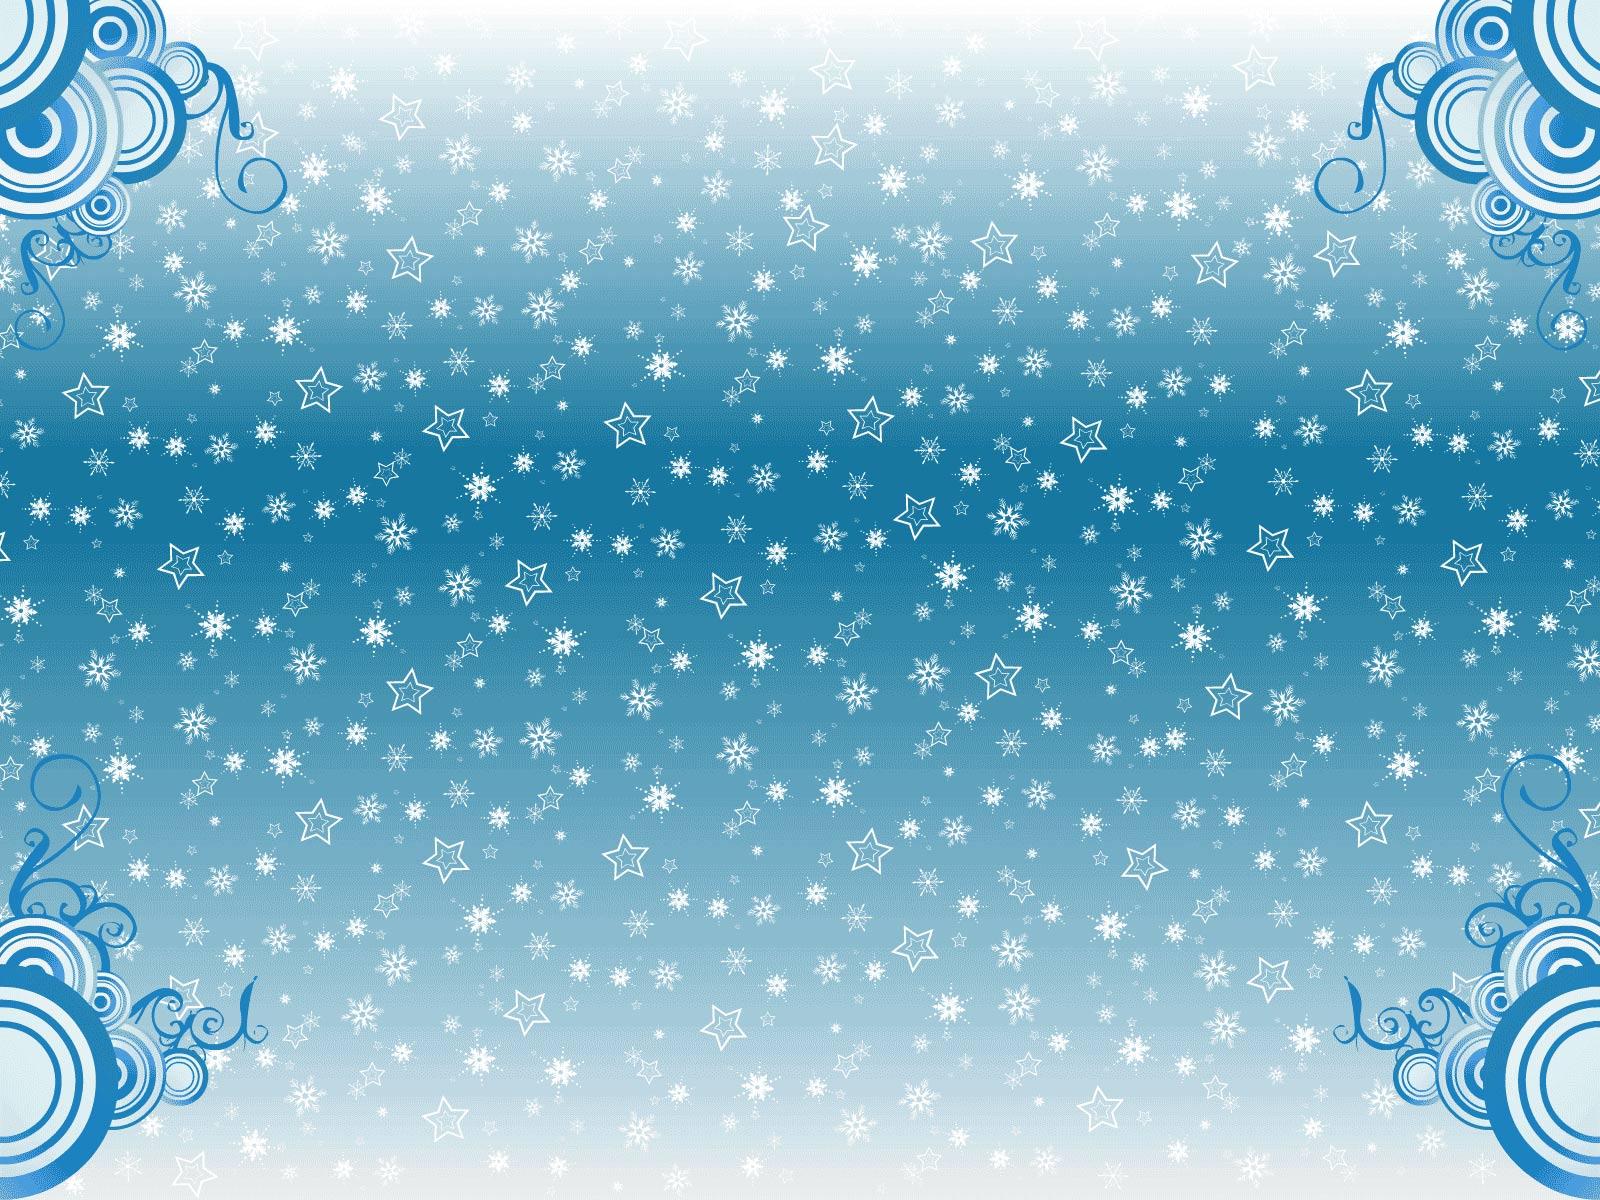 Best Free Winter Wallpapers Computer Wallpaper   Free Wallpaper